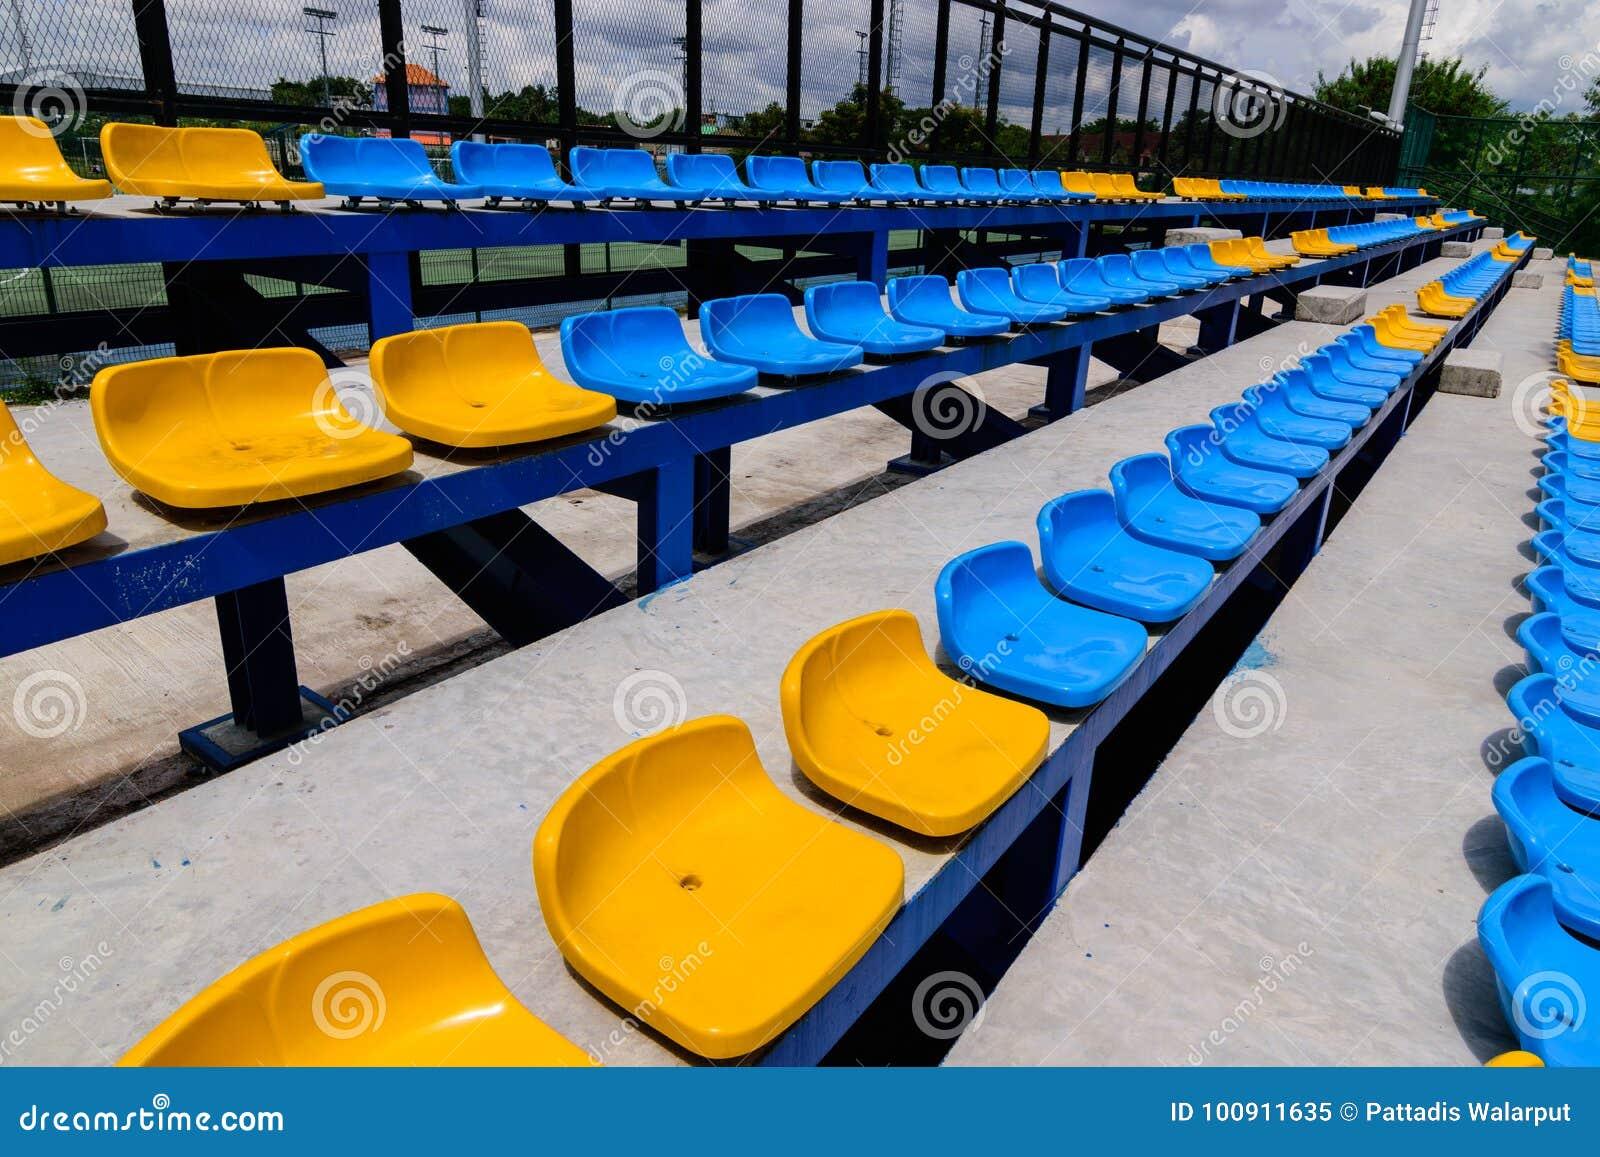 Empty Tennis Court Chairs